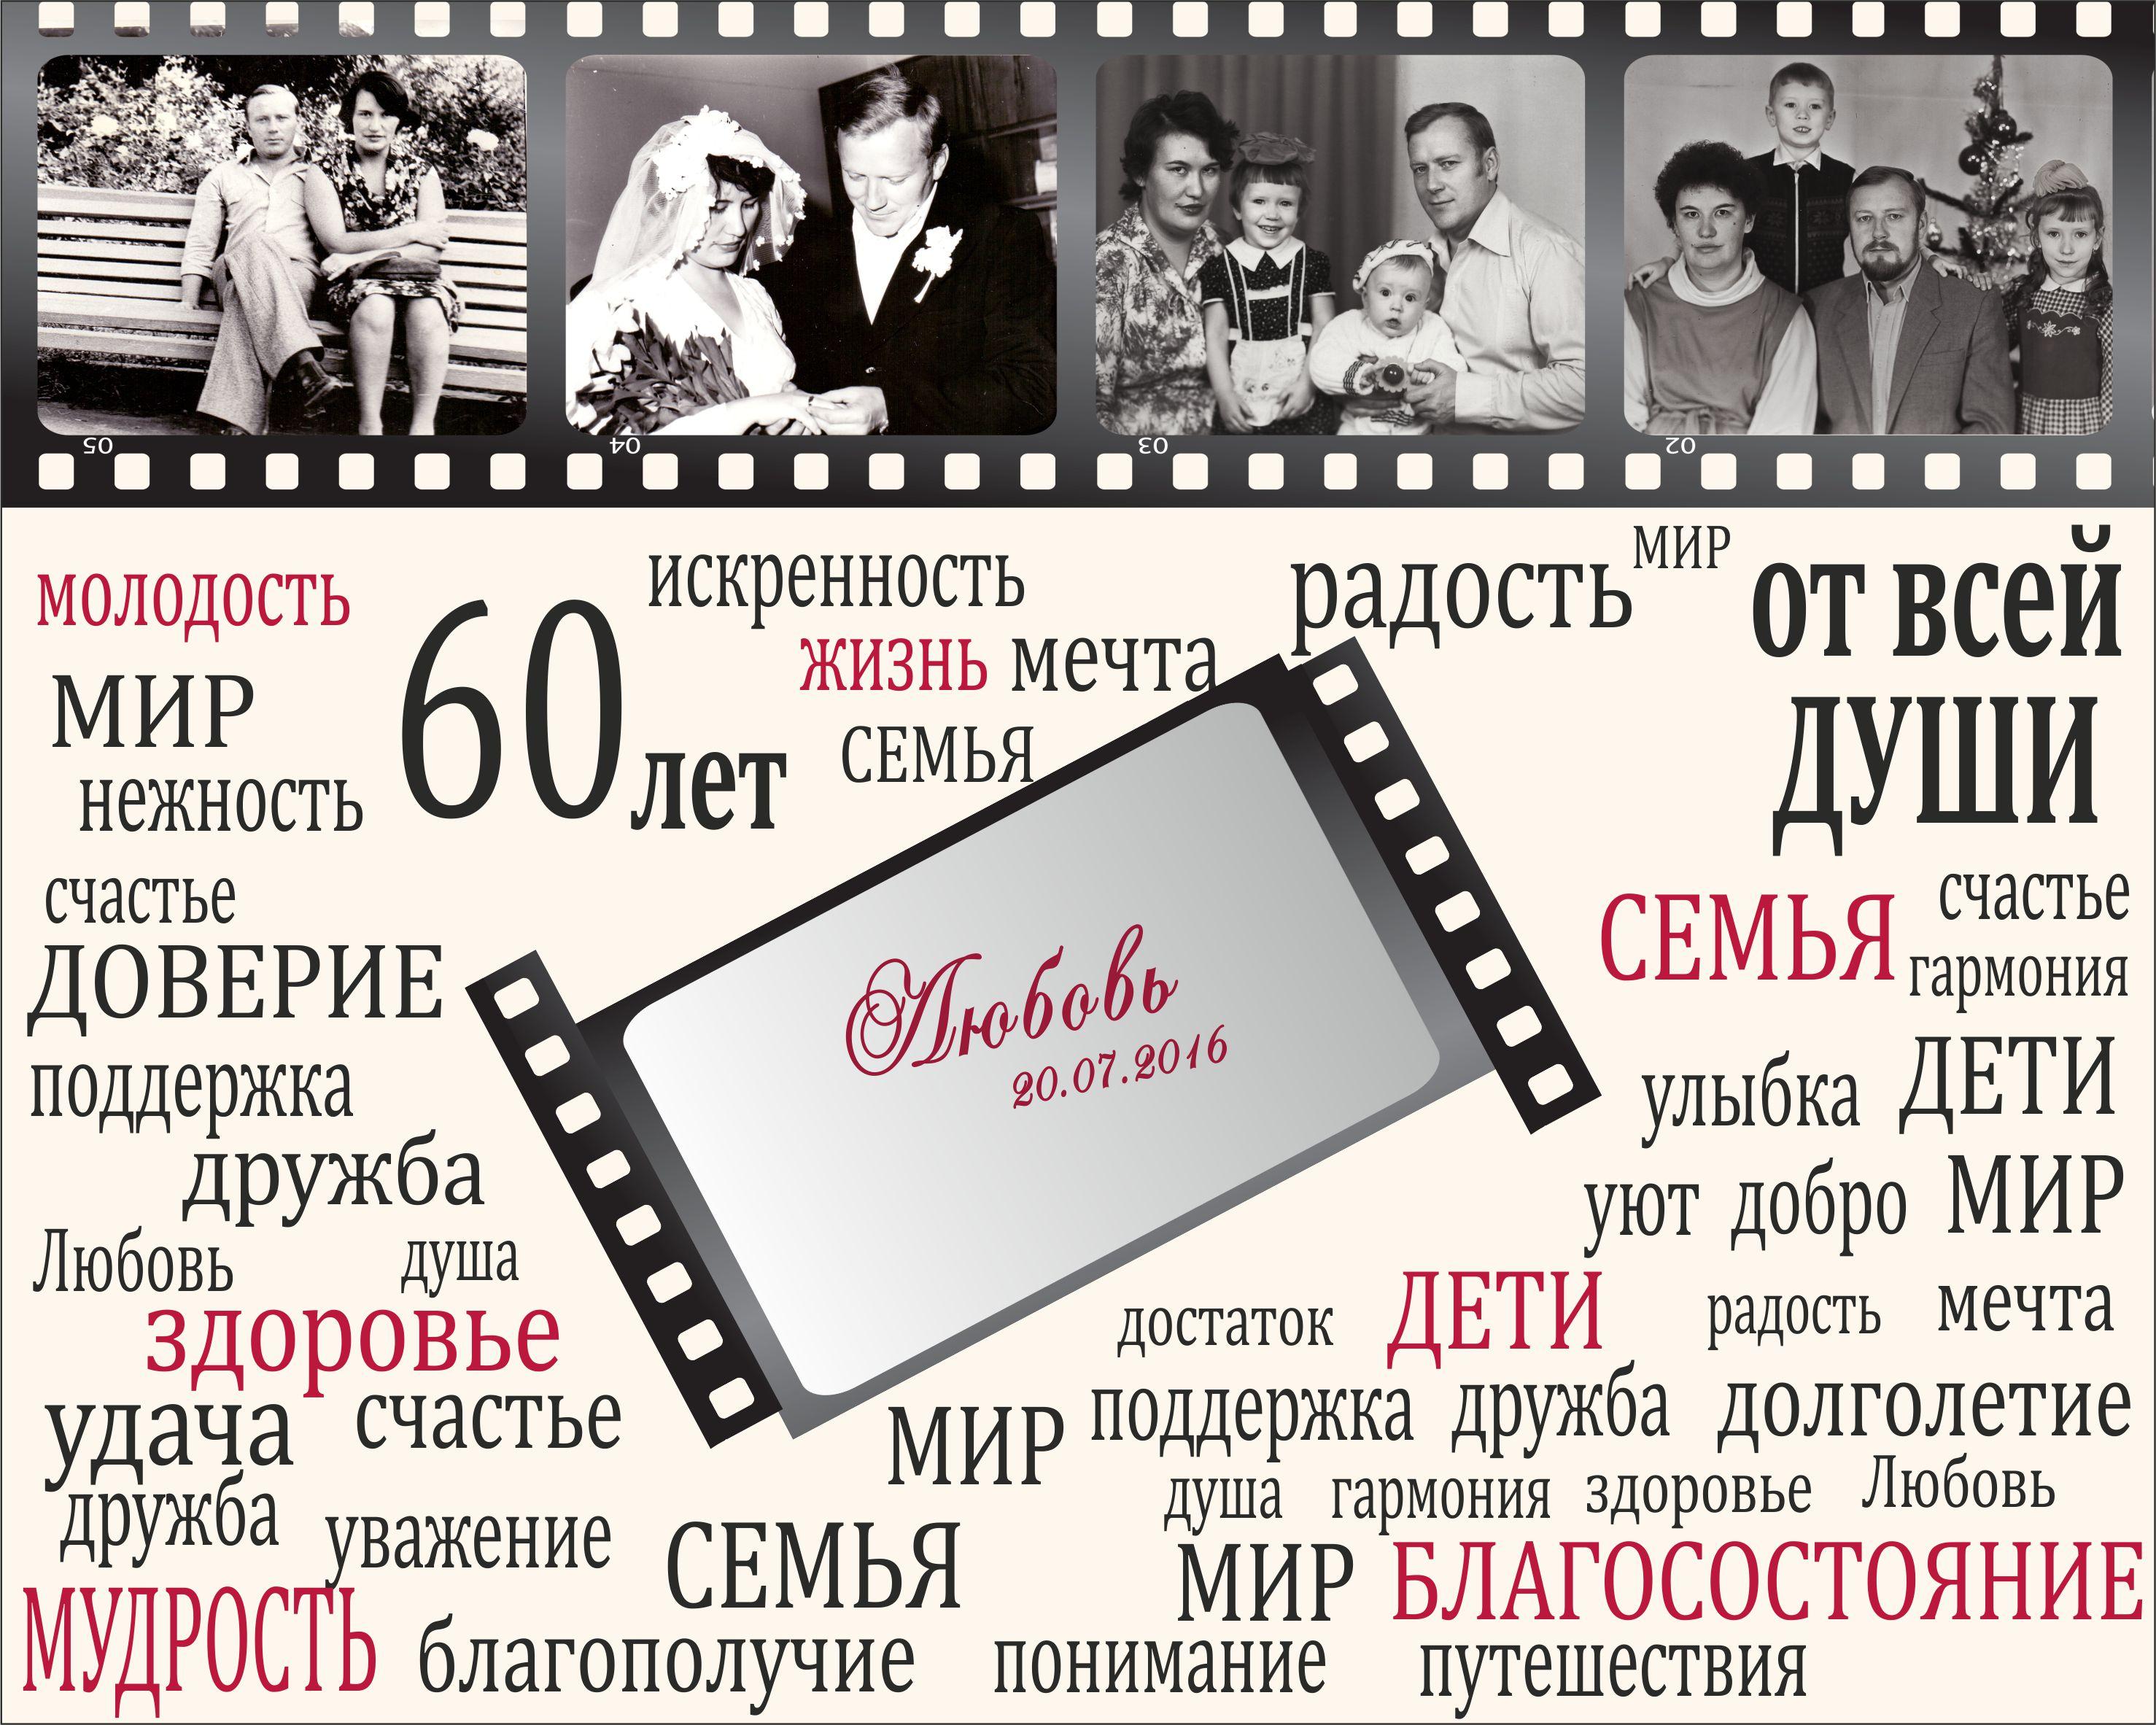 Пресс_стена_на_юбилей__хангаби_Алматы.jpg